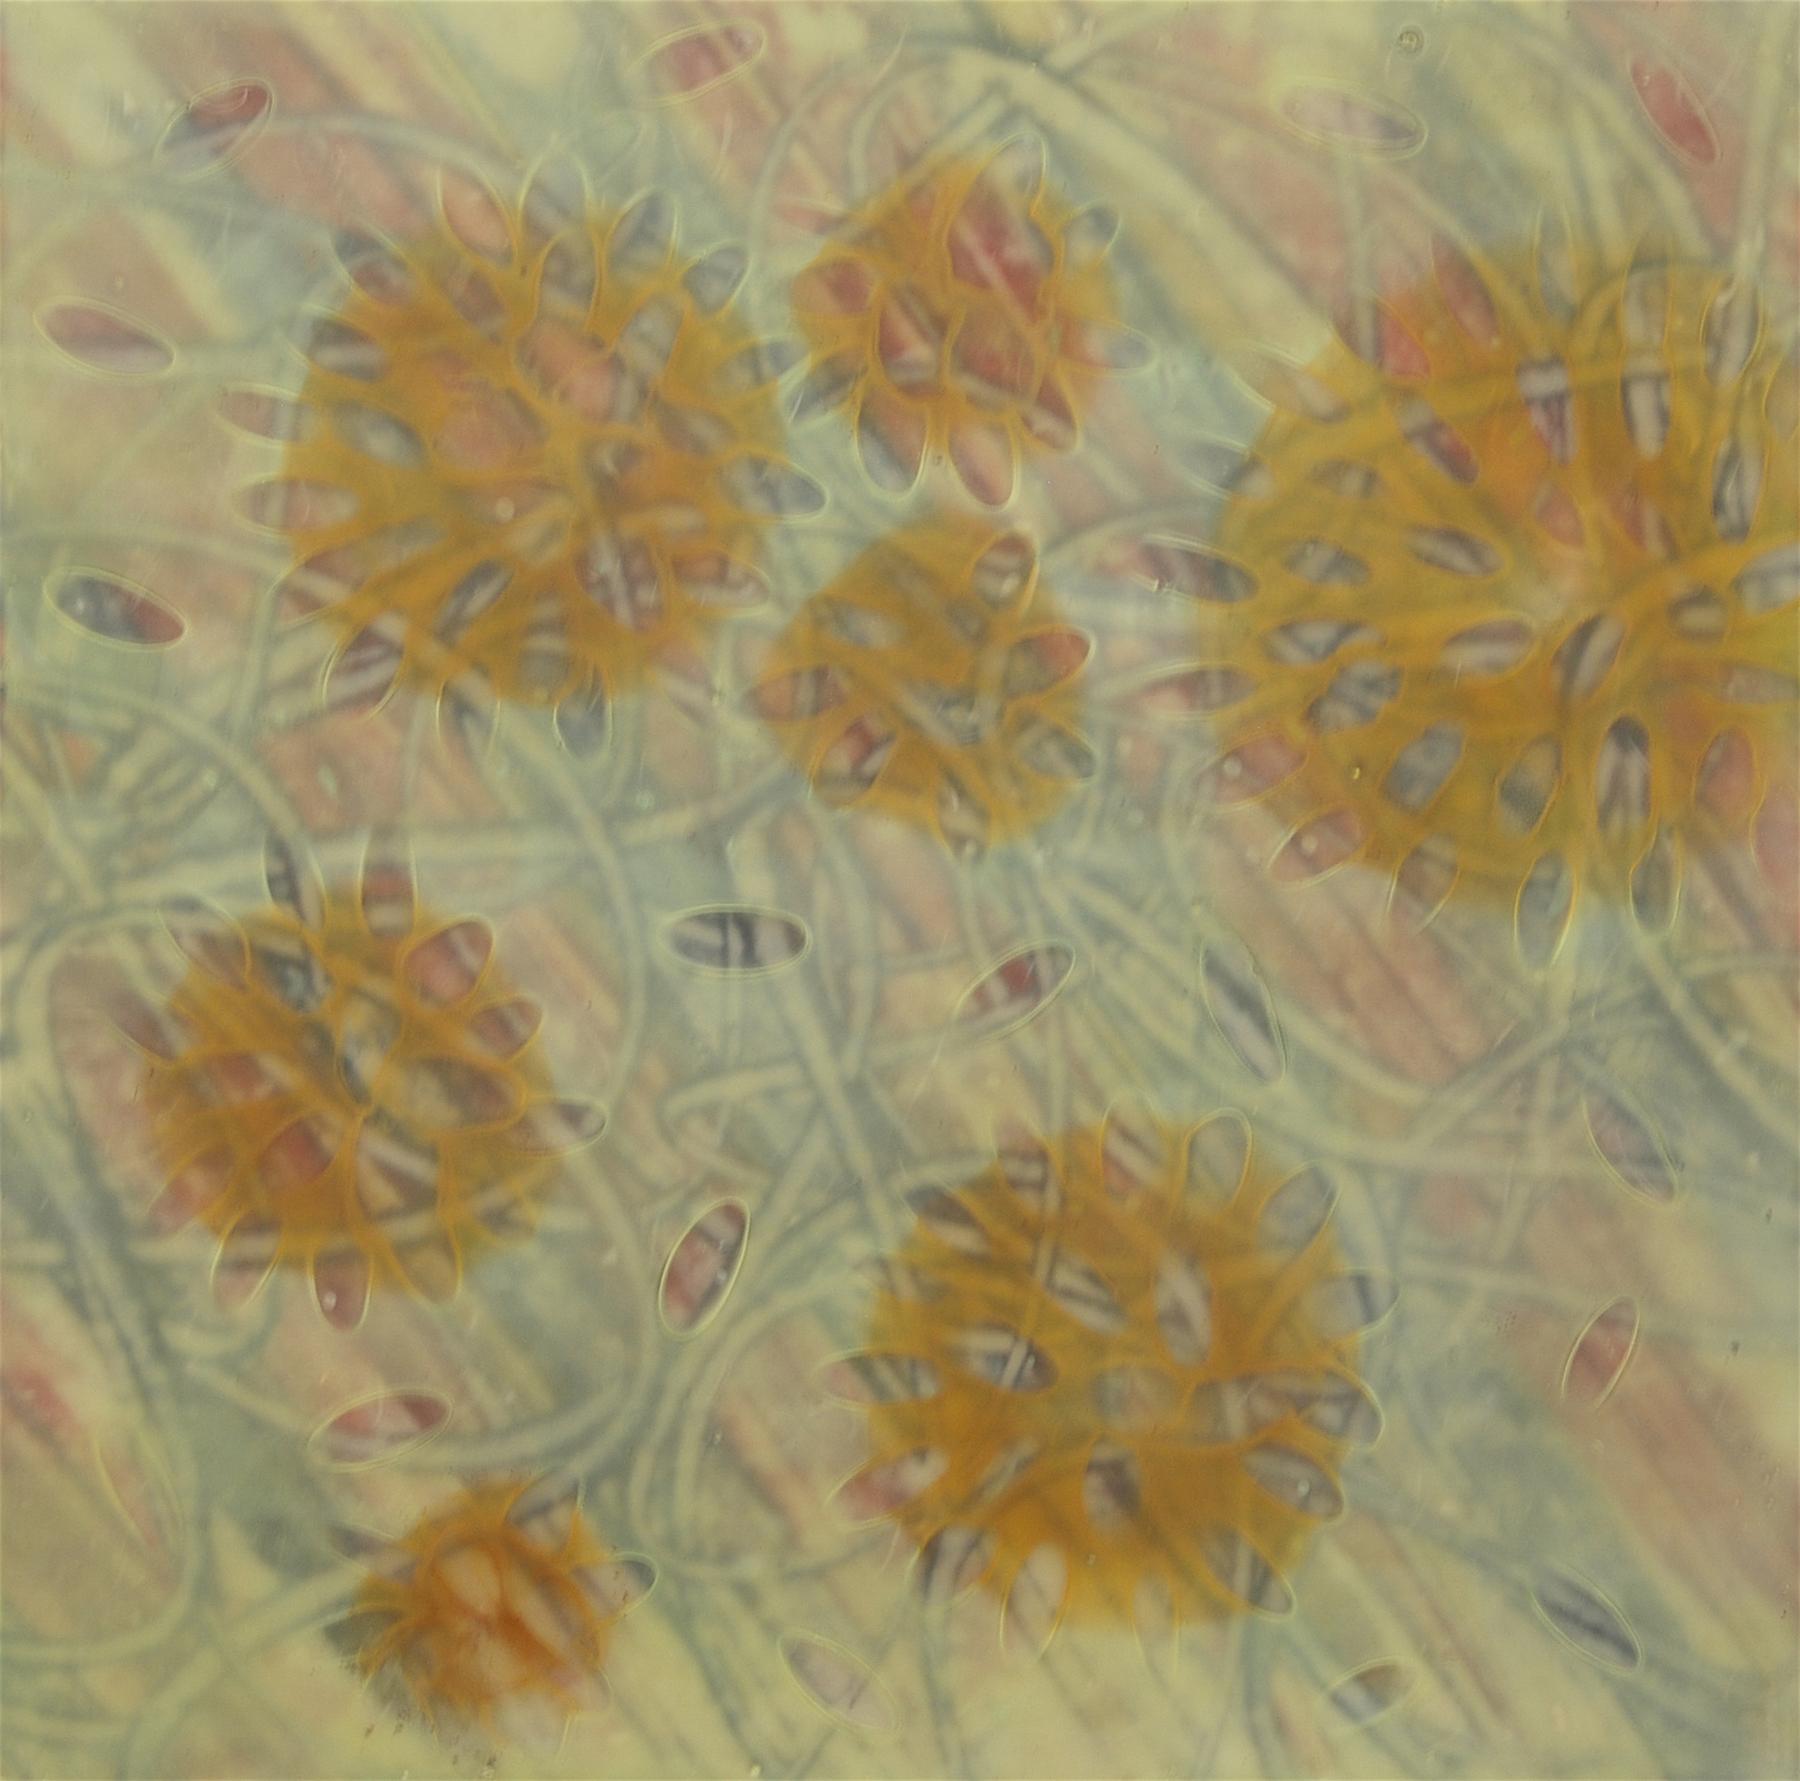 K. Hartung,  Entanglements 10 , encaustic and mixed media, 12x12